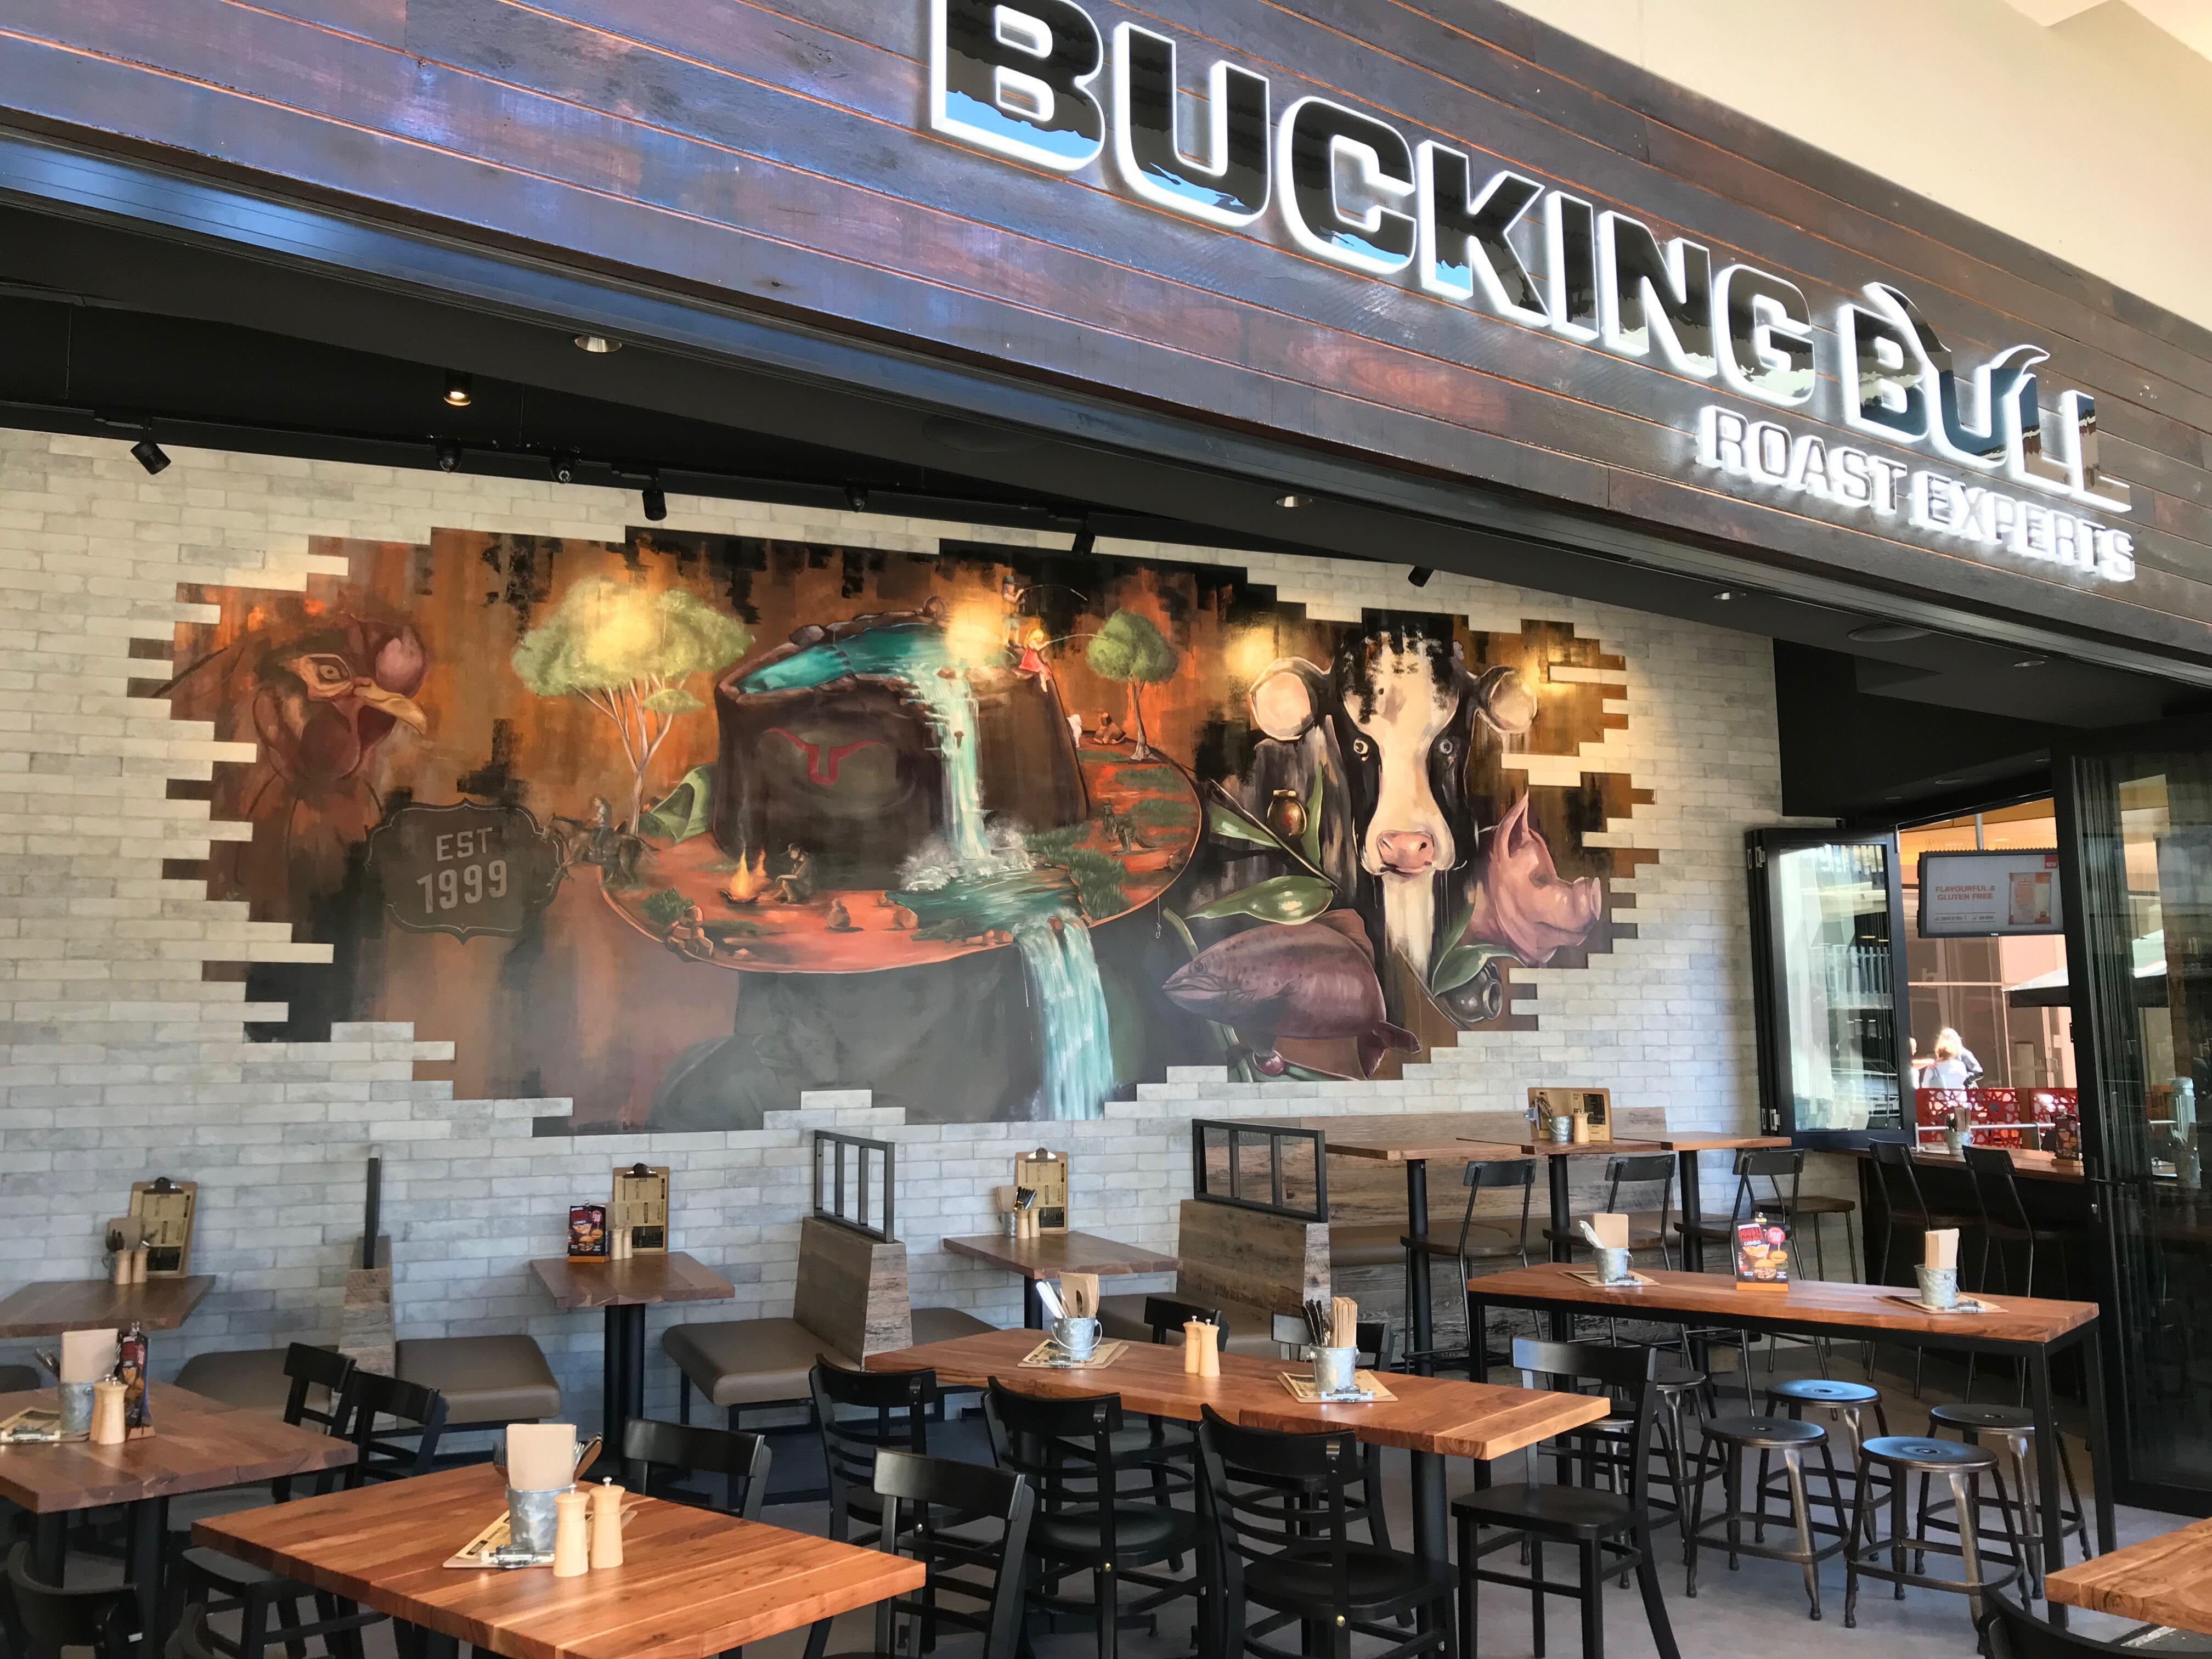 bucking-bull-roast-experts-food-takeaway-shop-hervey-bay-1